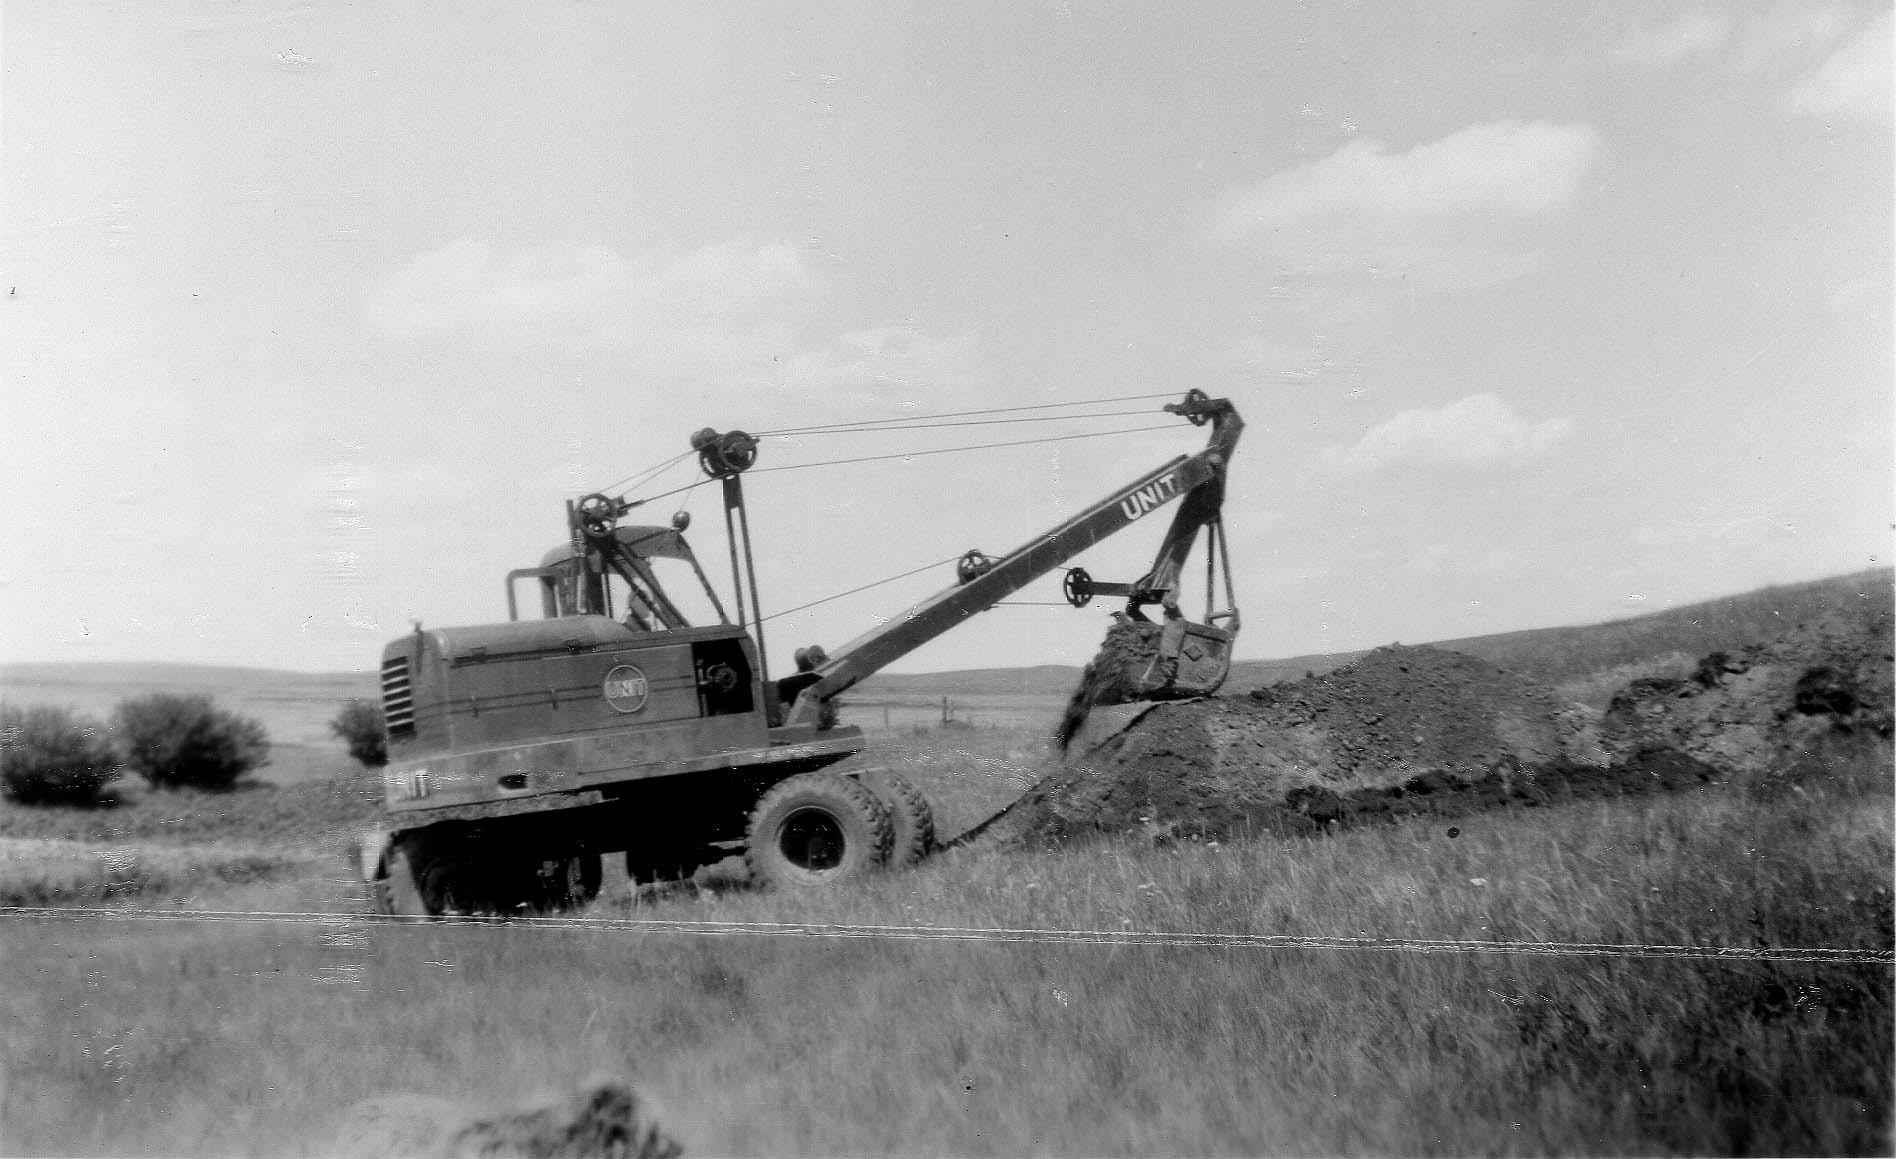 North dakota logan county fredonia - 22 G C Brauer Excavuting Unit Howard Hunkler Ranch